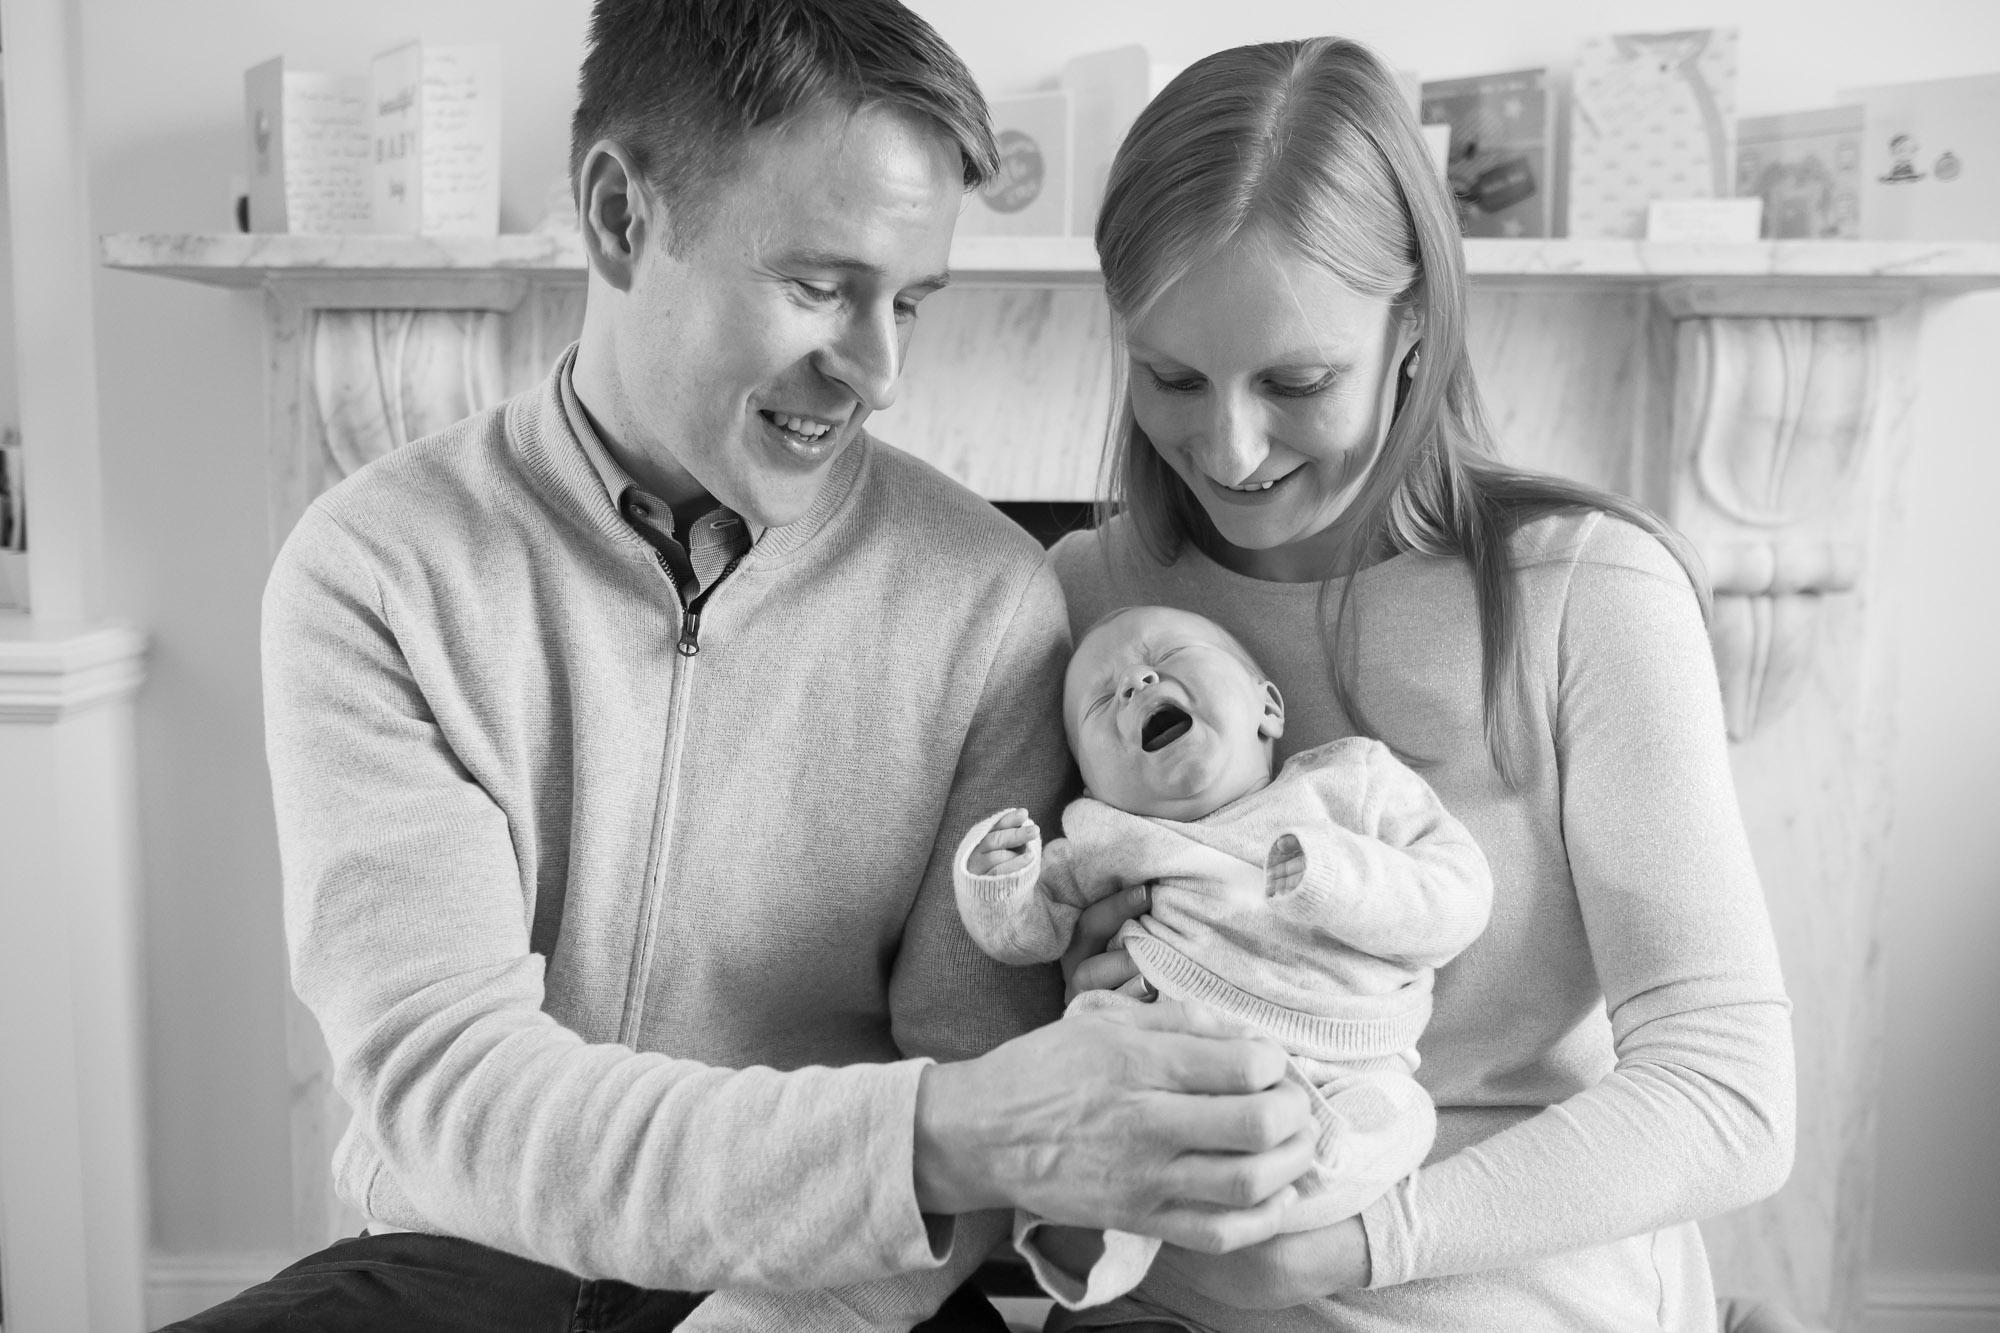 newborn-baby-family-portrait-photographer-057.jpg